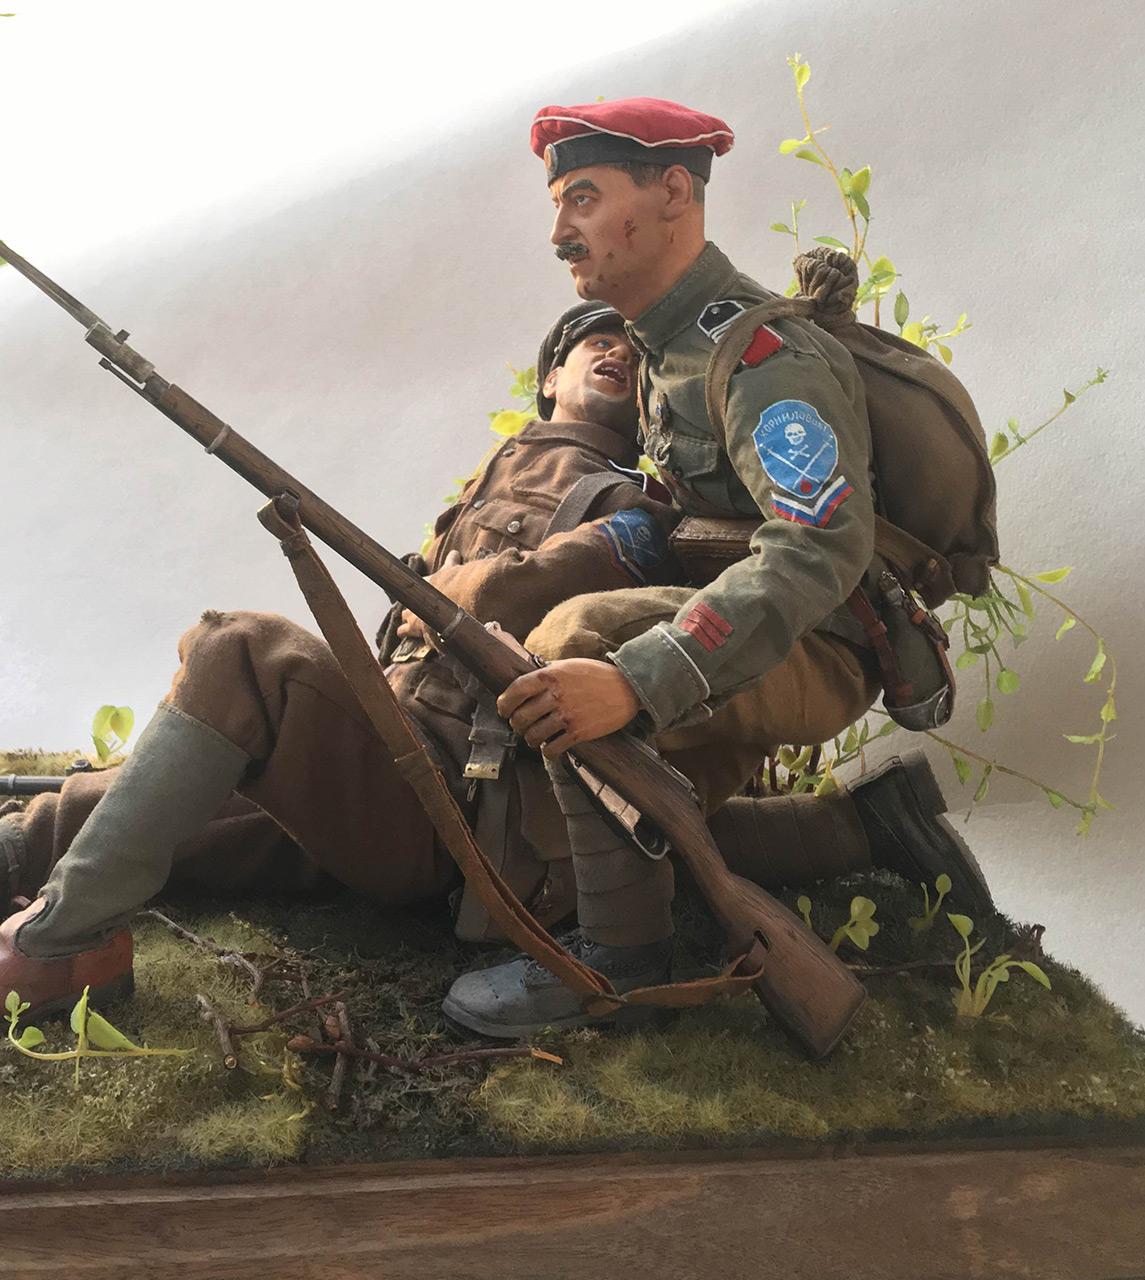 Figures: Kornilov shock regiment, summer 1919, photo #3